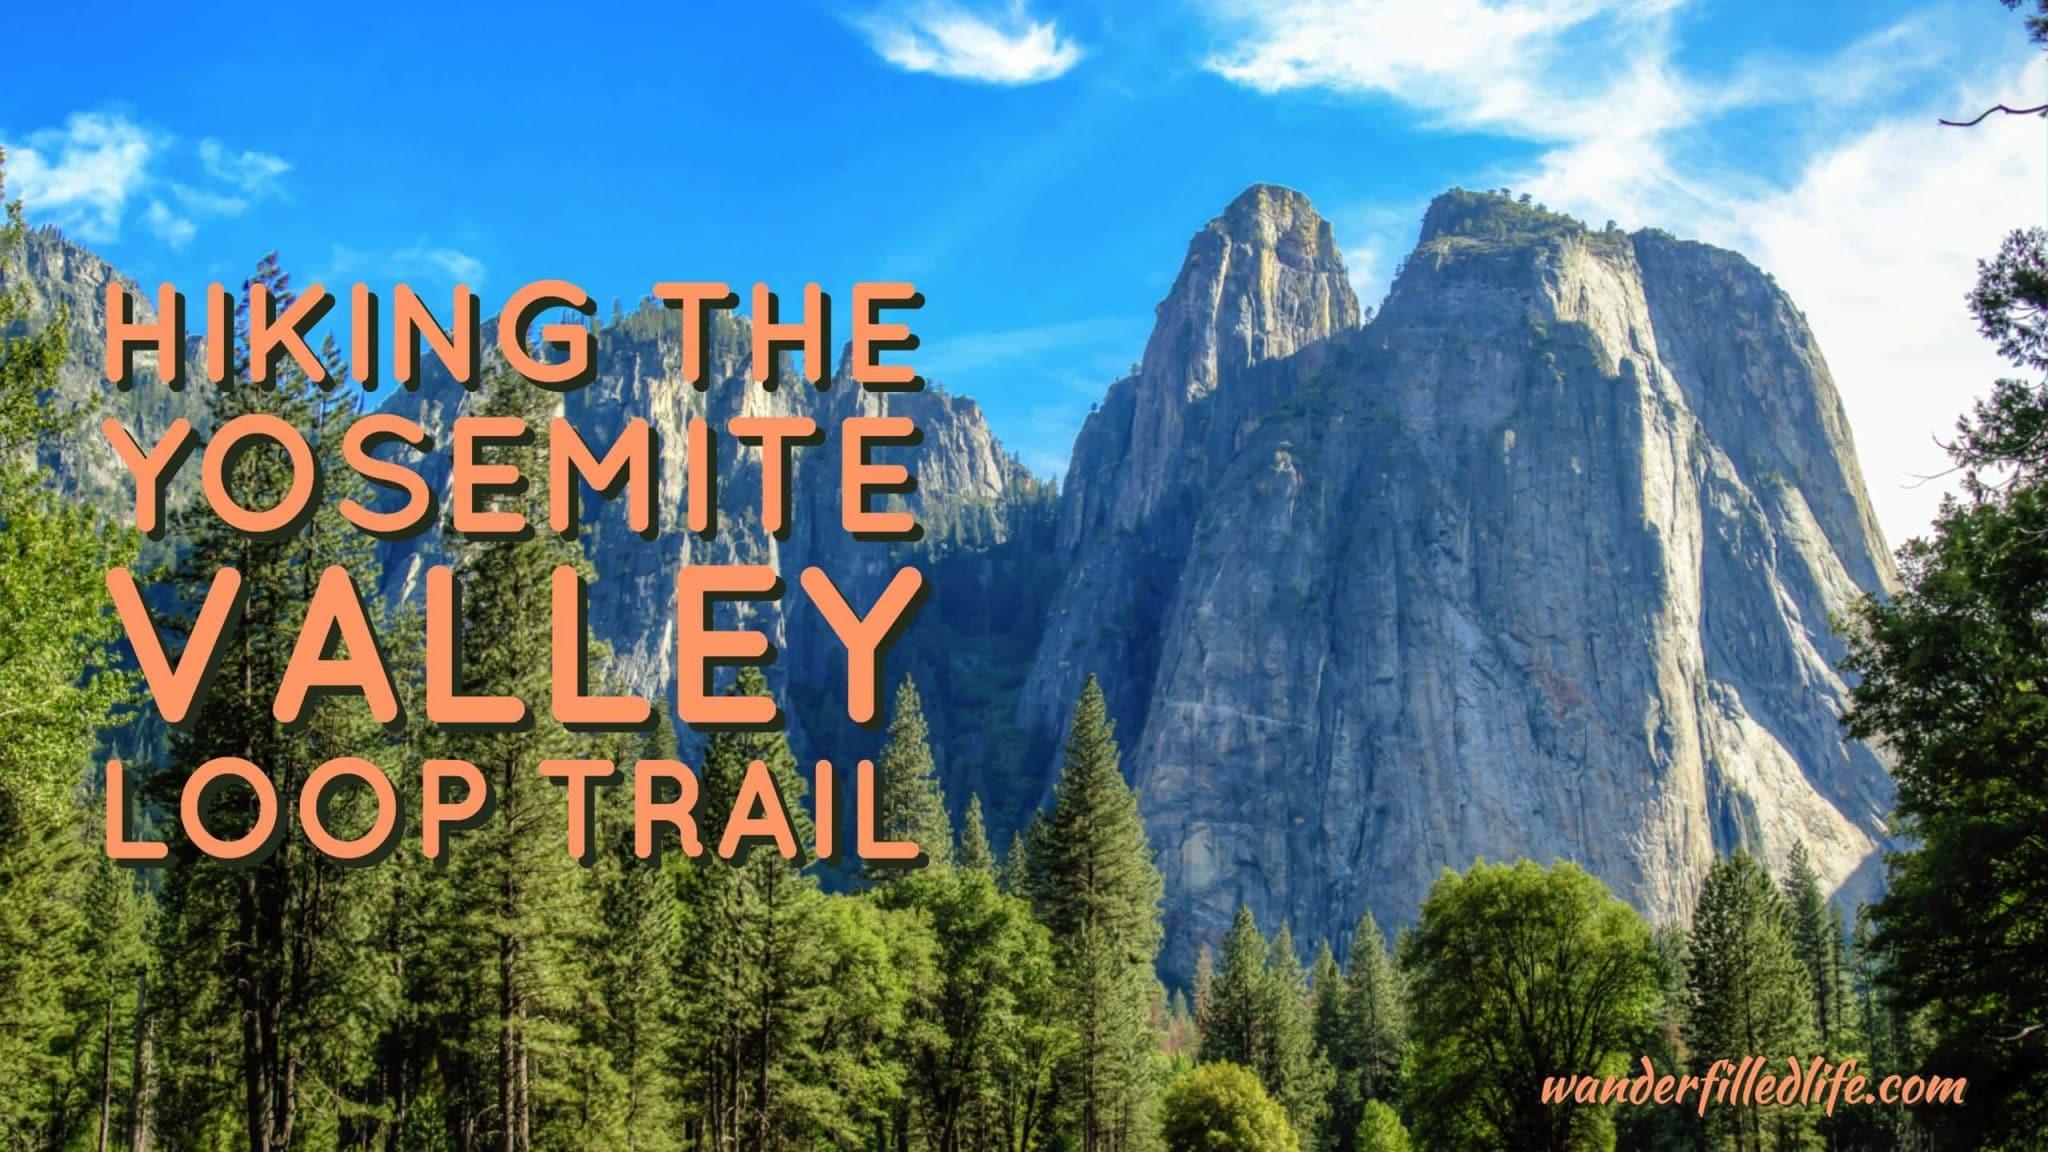 Hiking the Yosemite Valley Loop Trail